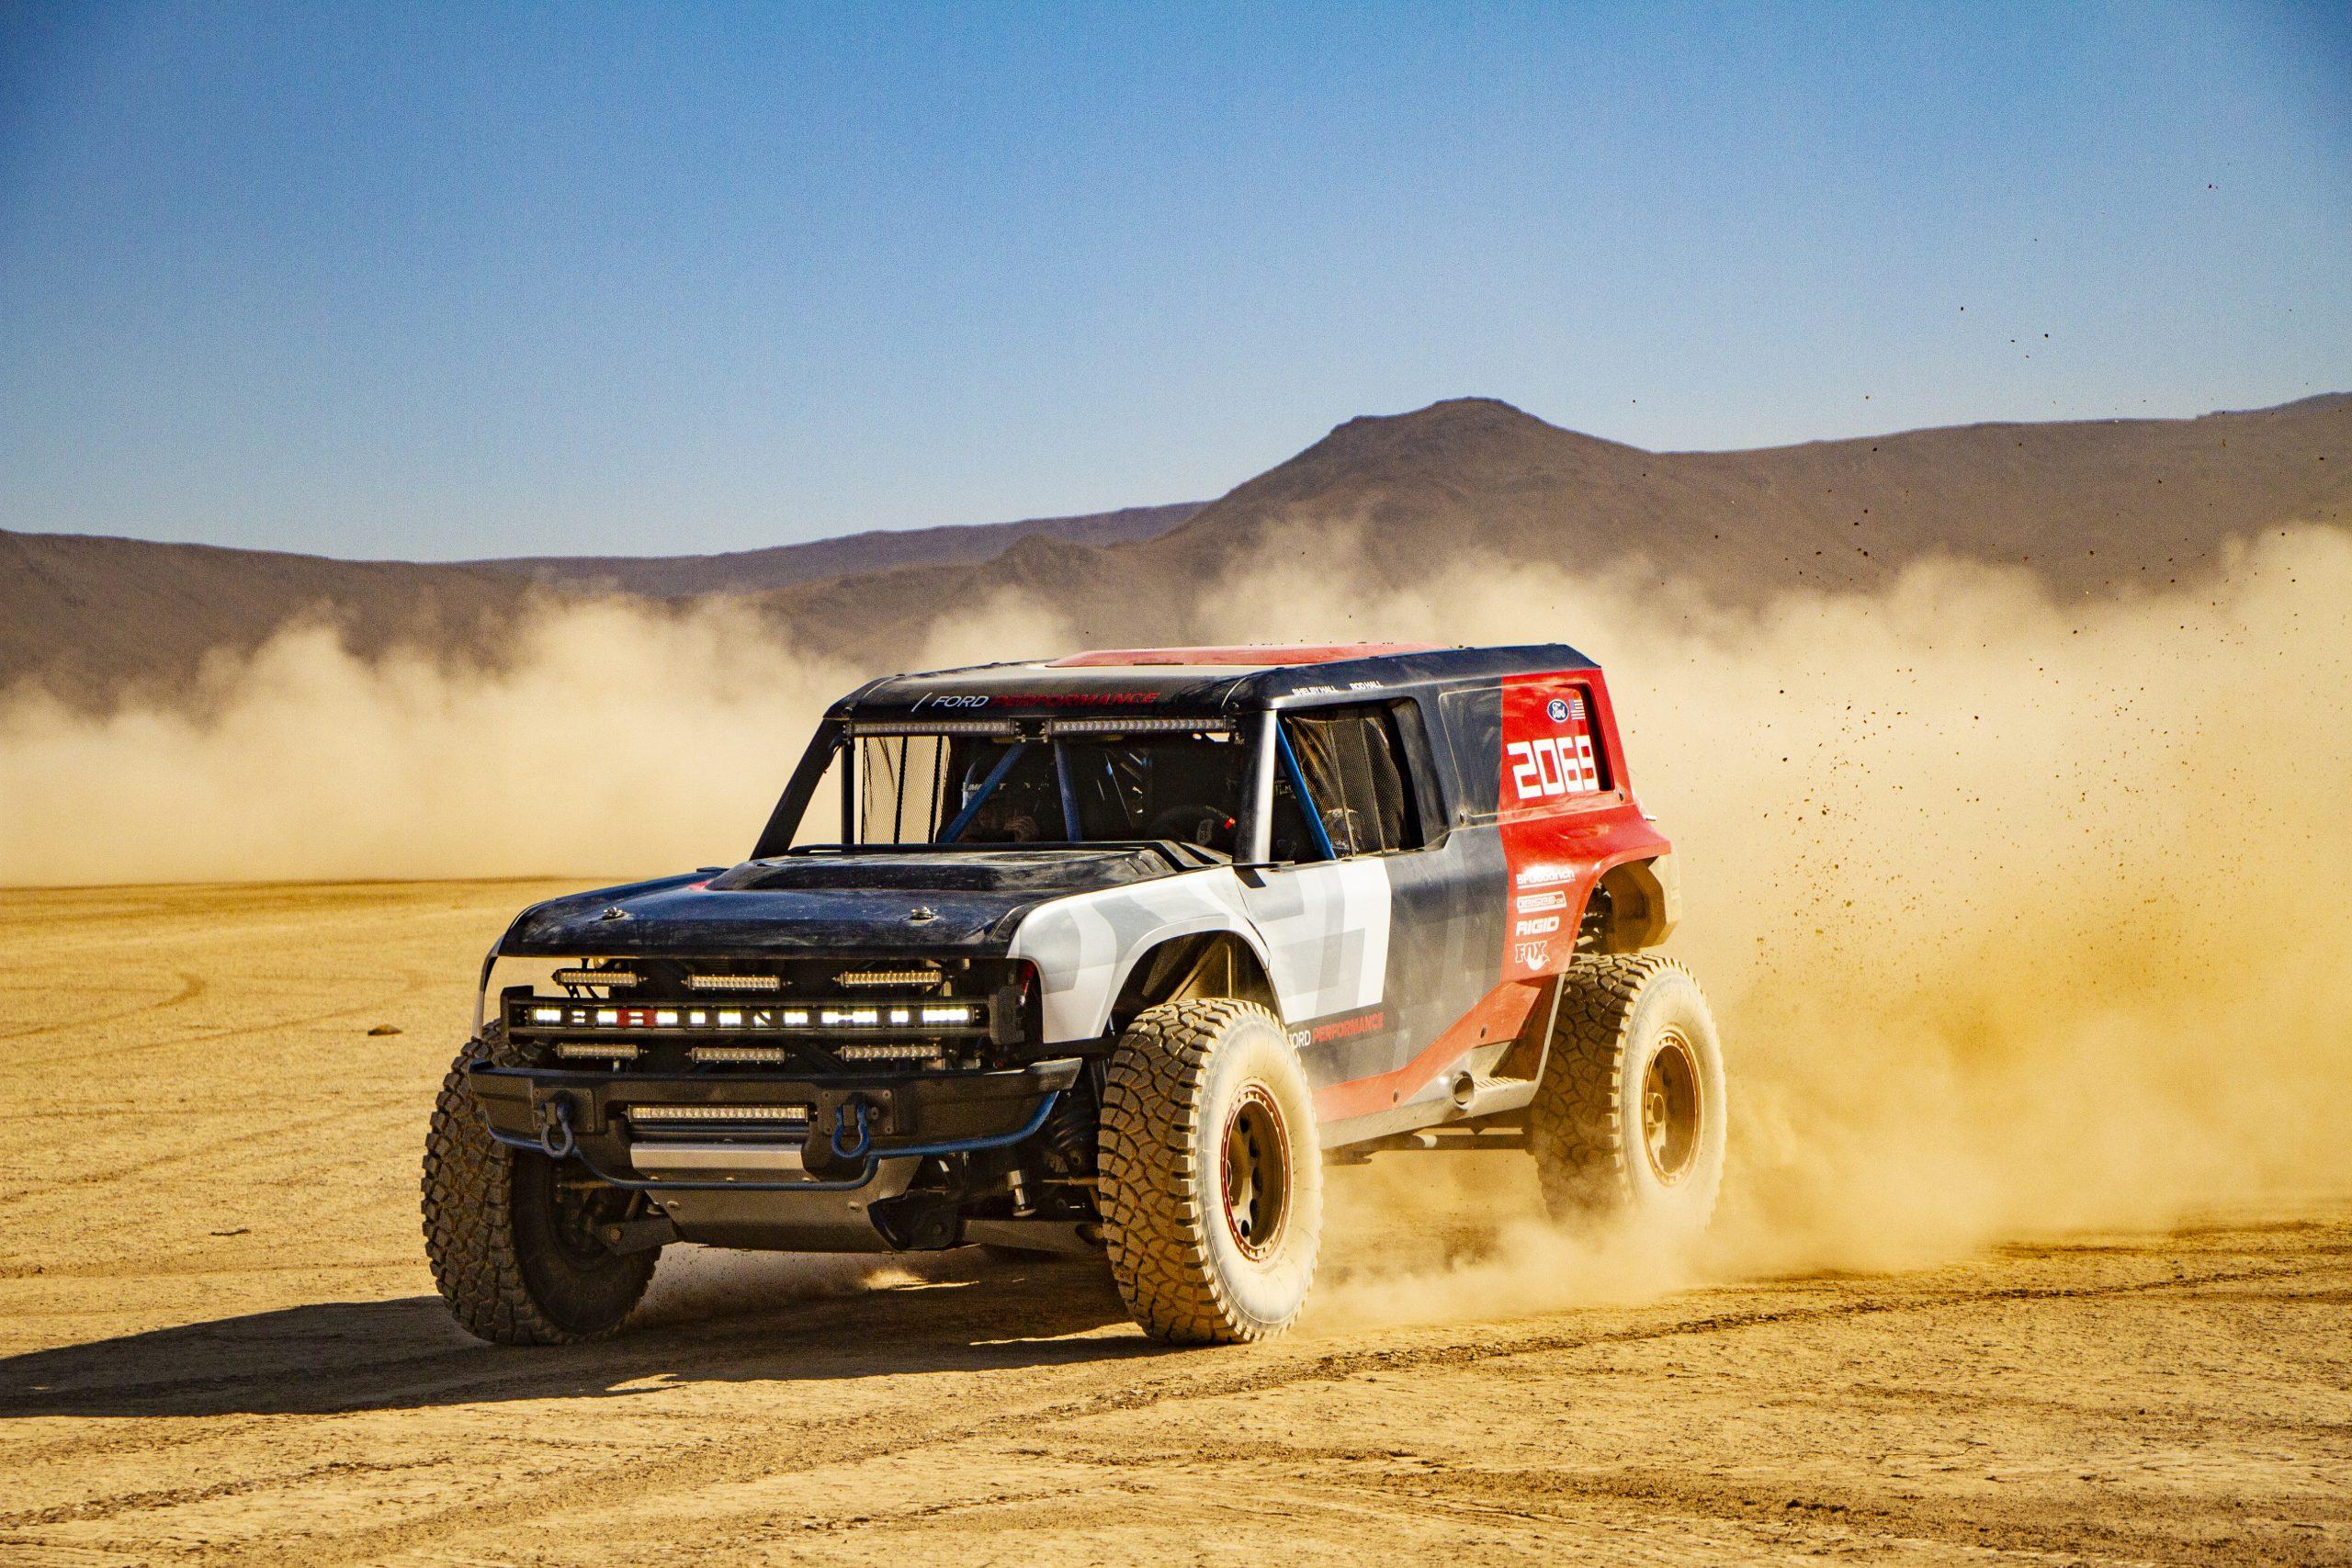 Ford Bronco R race prototype Baja desert